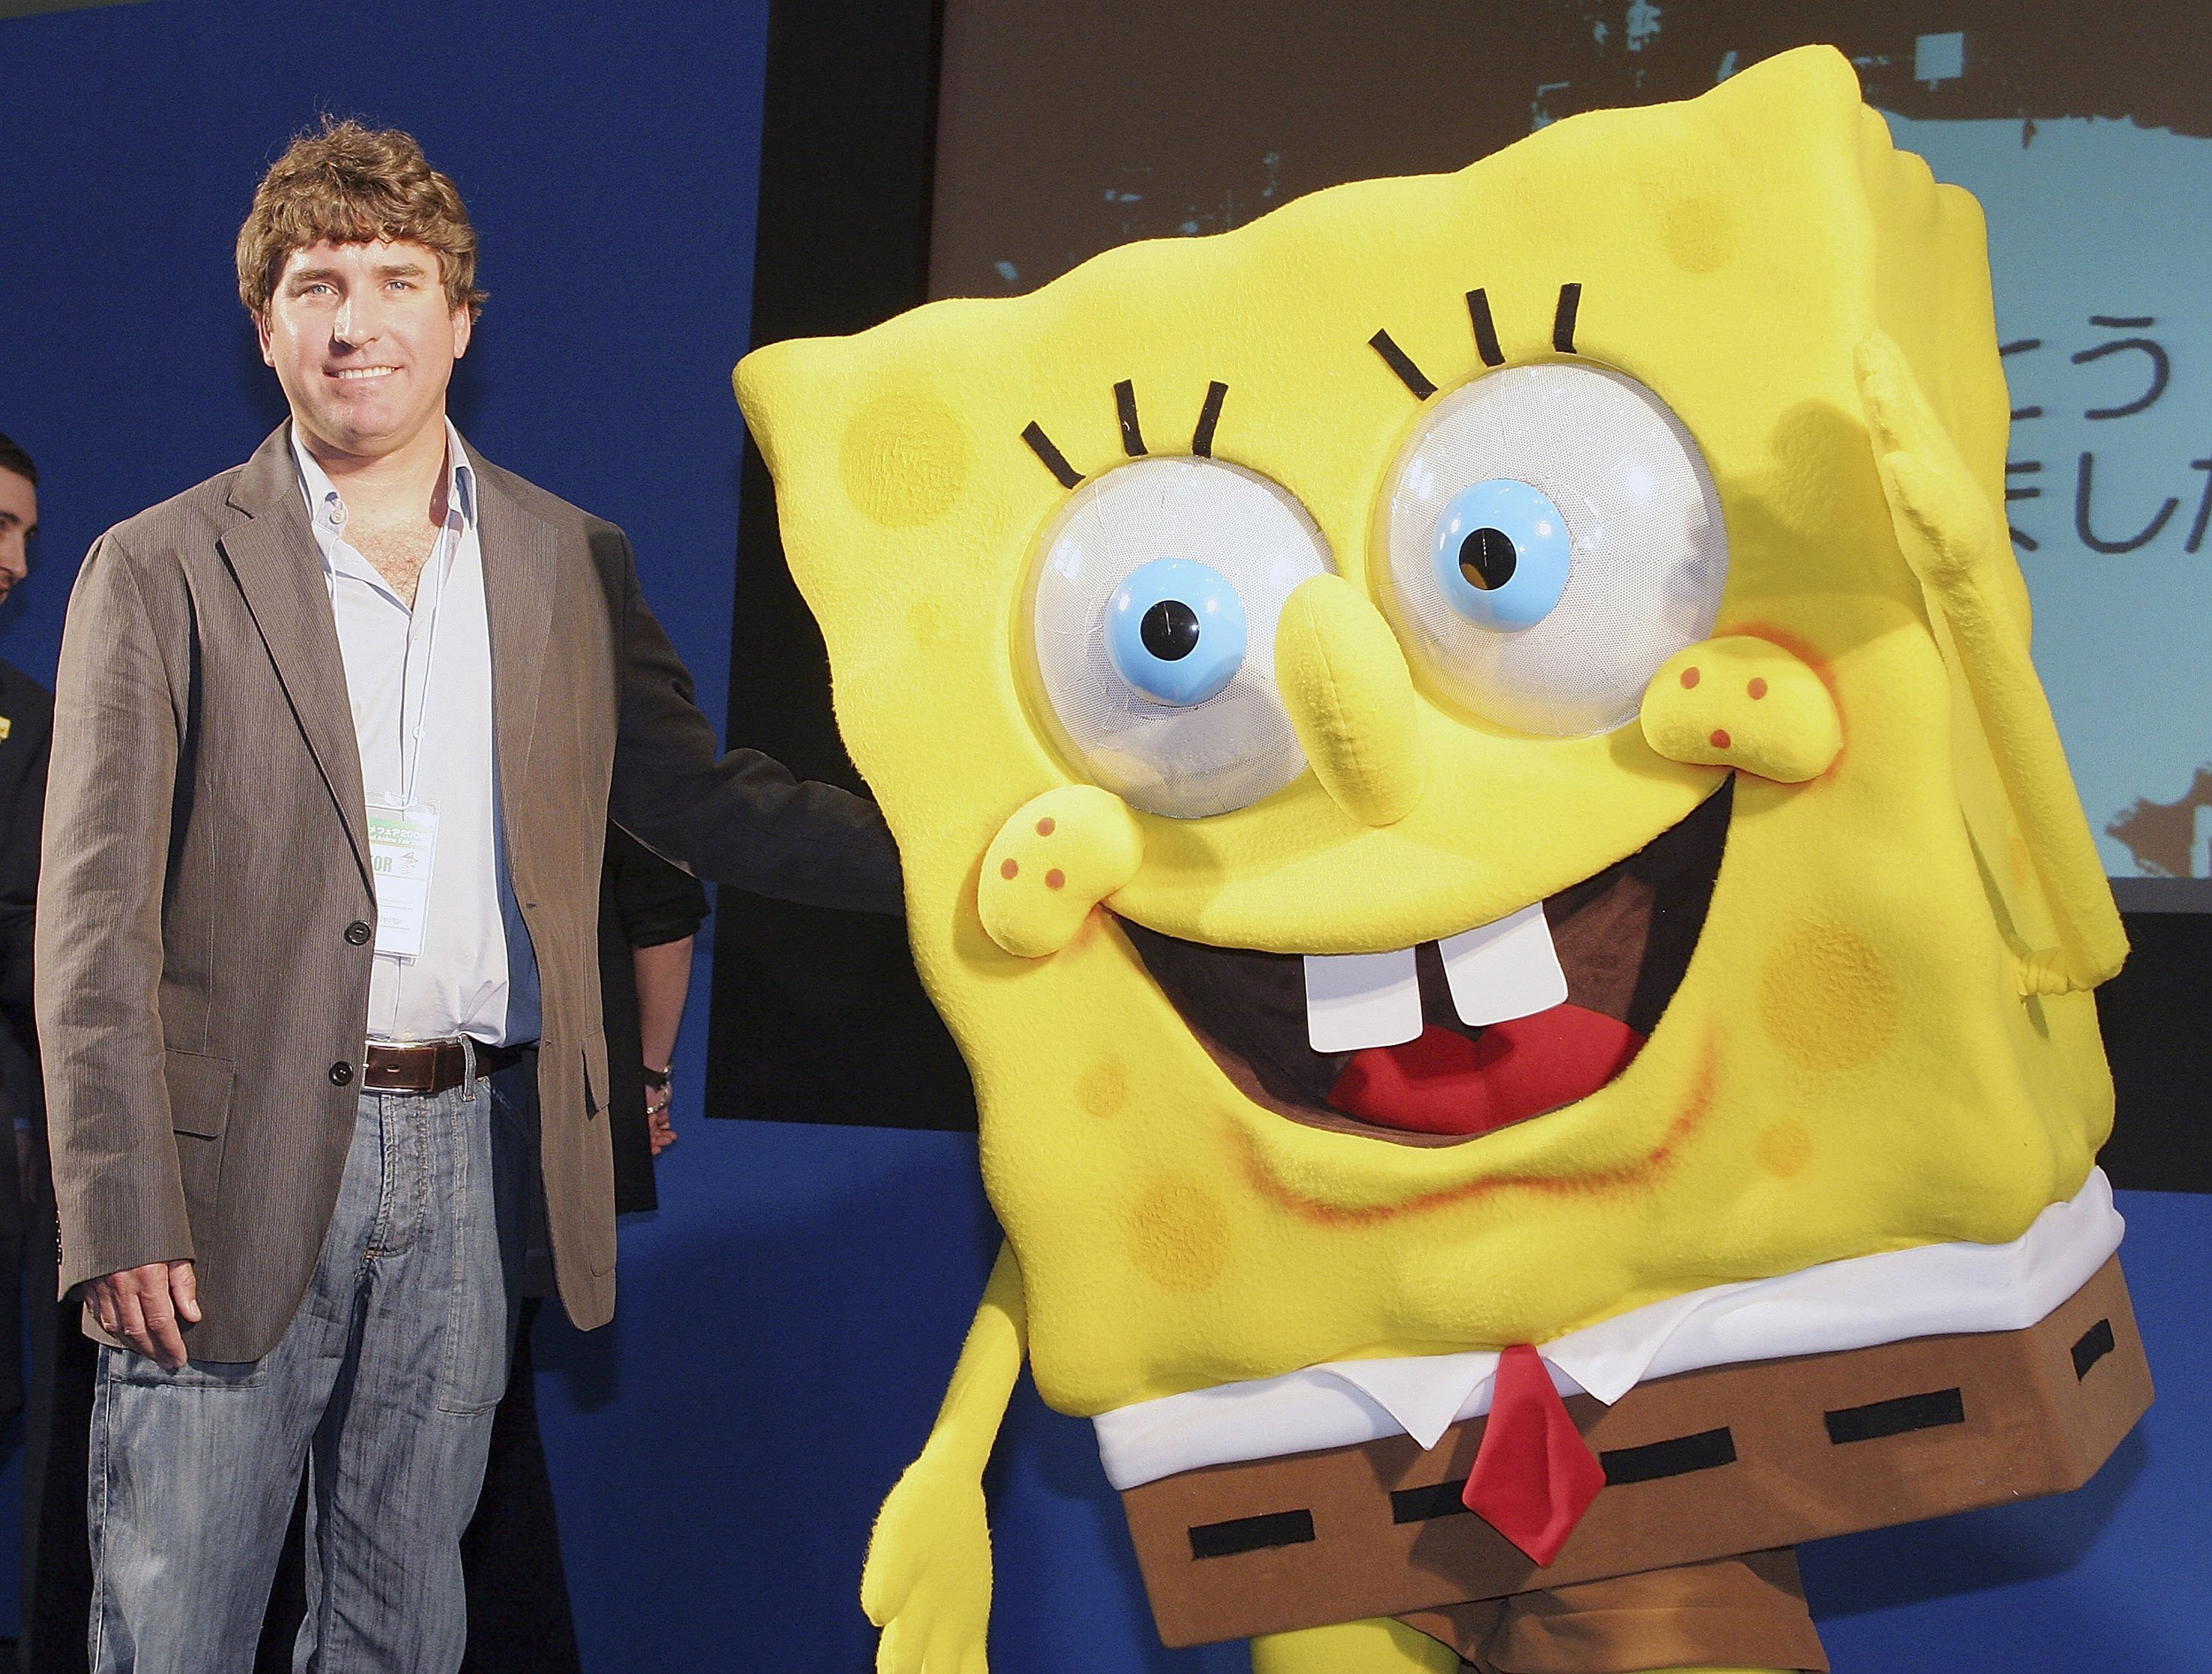 SpongeBob Squarepants' creator Stephen Hillenburg dies at 57